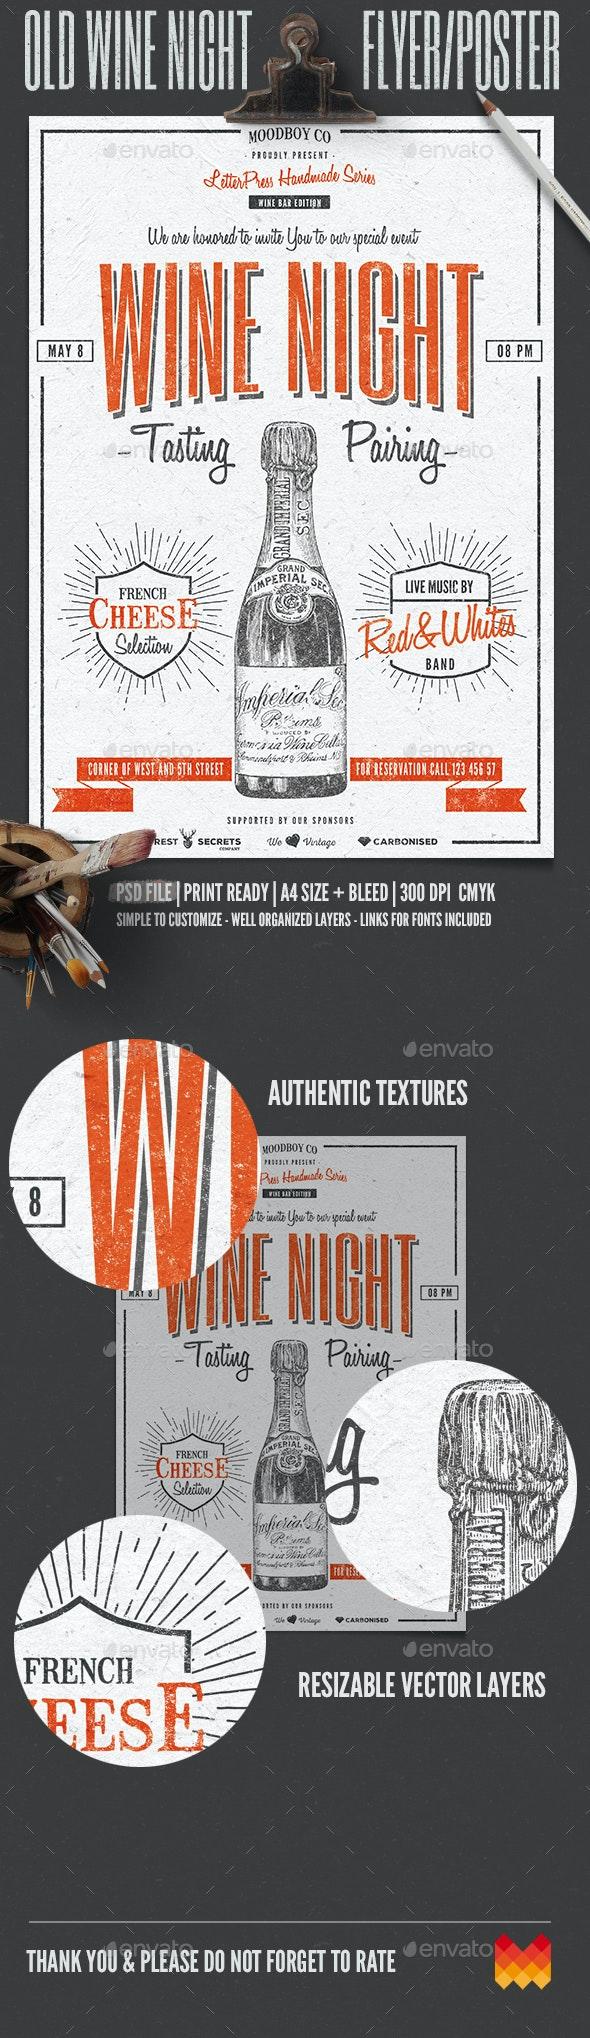 Vintage Wine Night Flyer/Poster - Flyers Print Templates